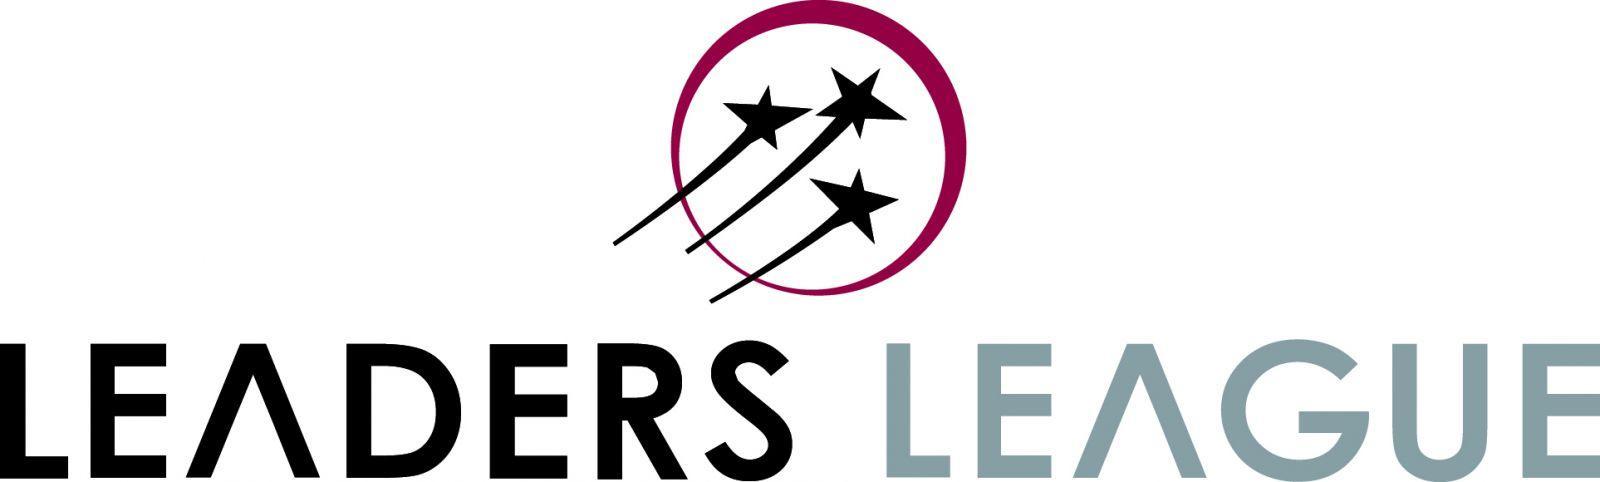 Leaders league_logo